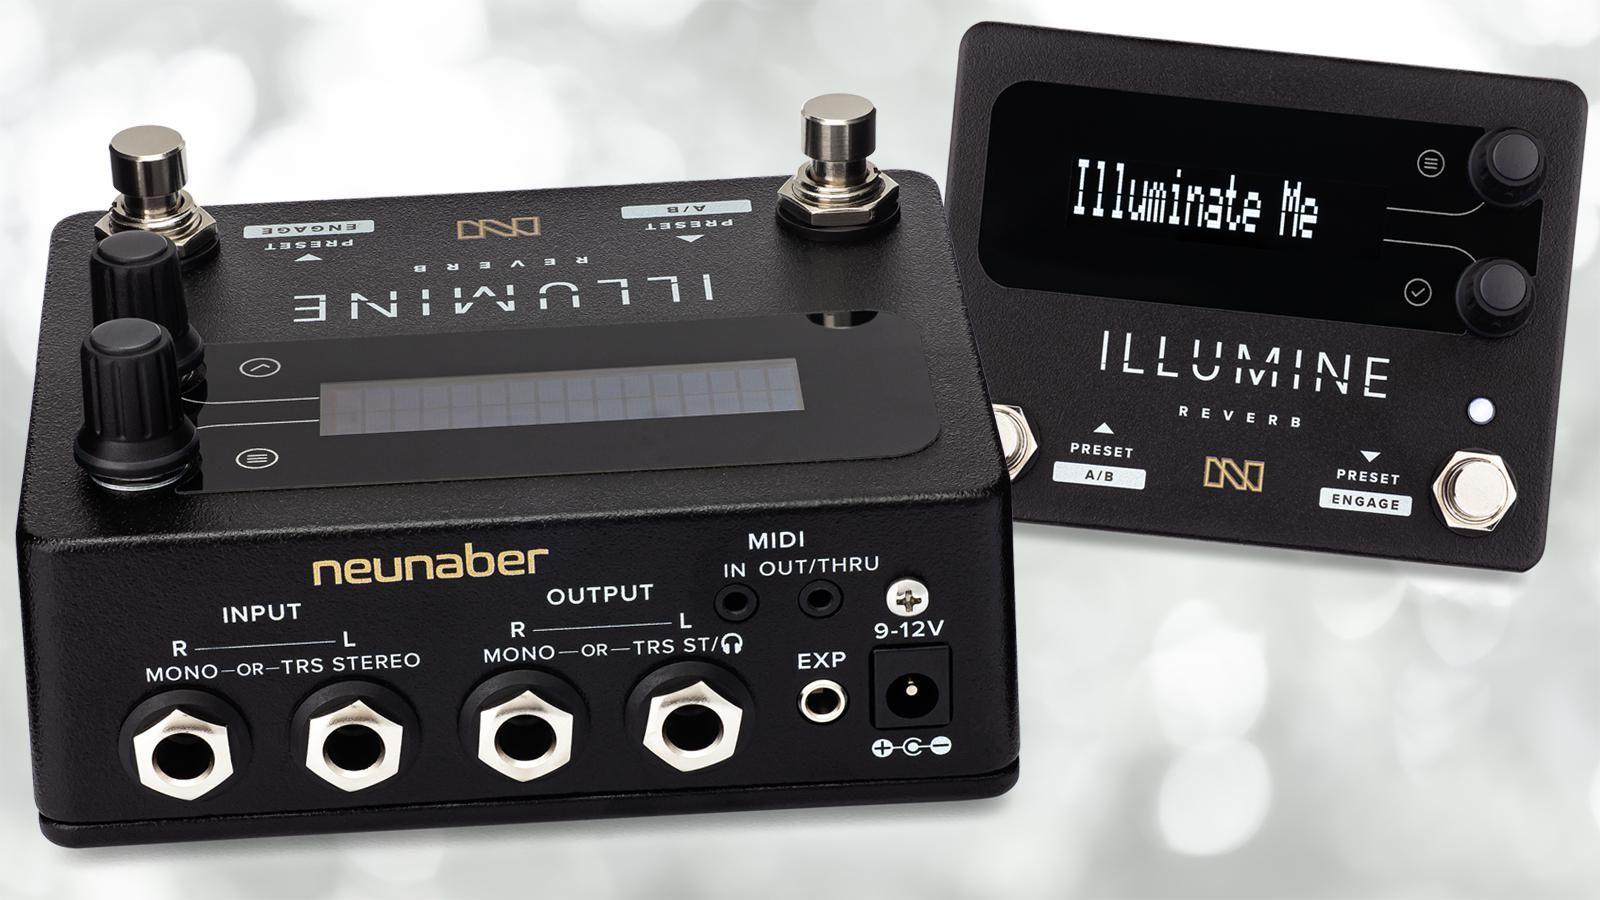 Neunaber Releases the ILLUMINE Reverb